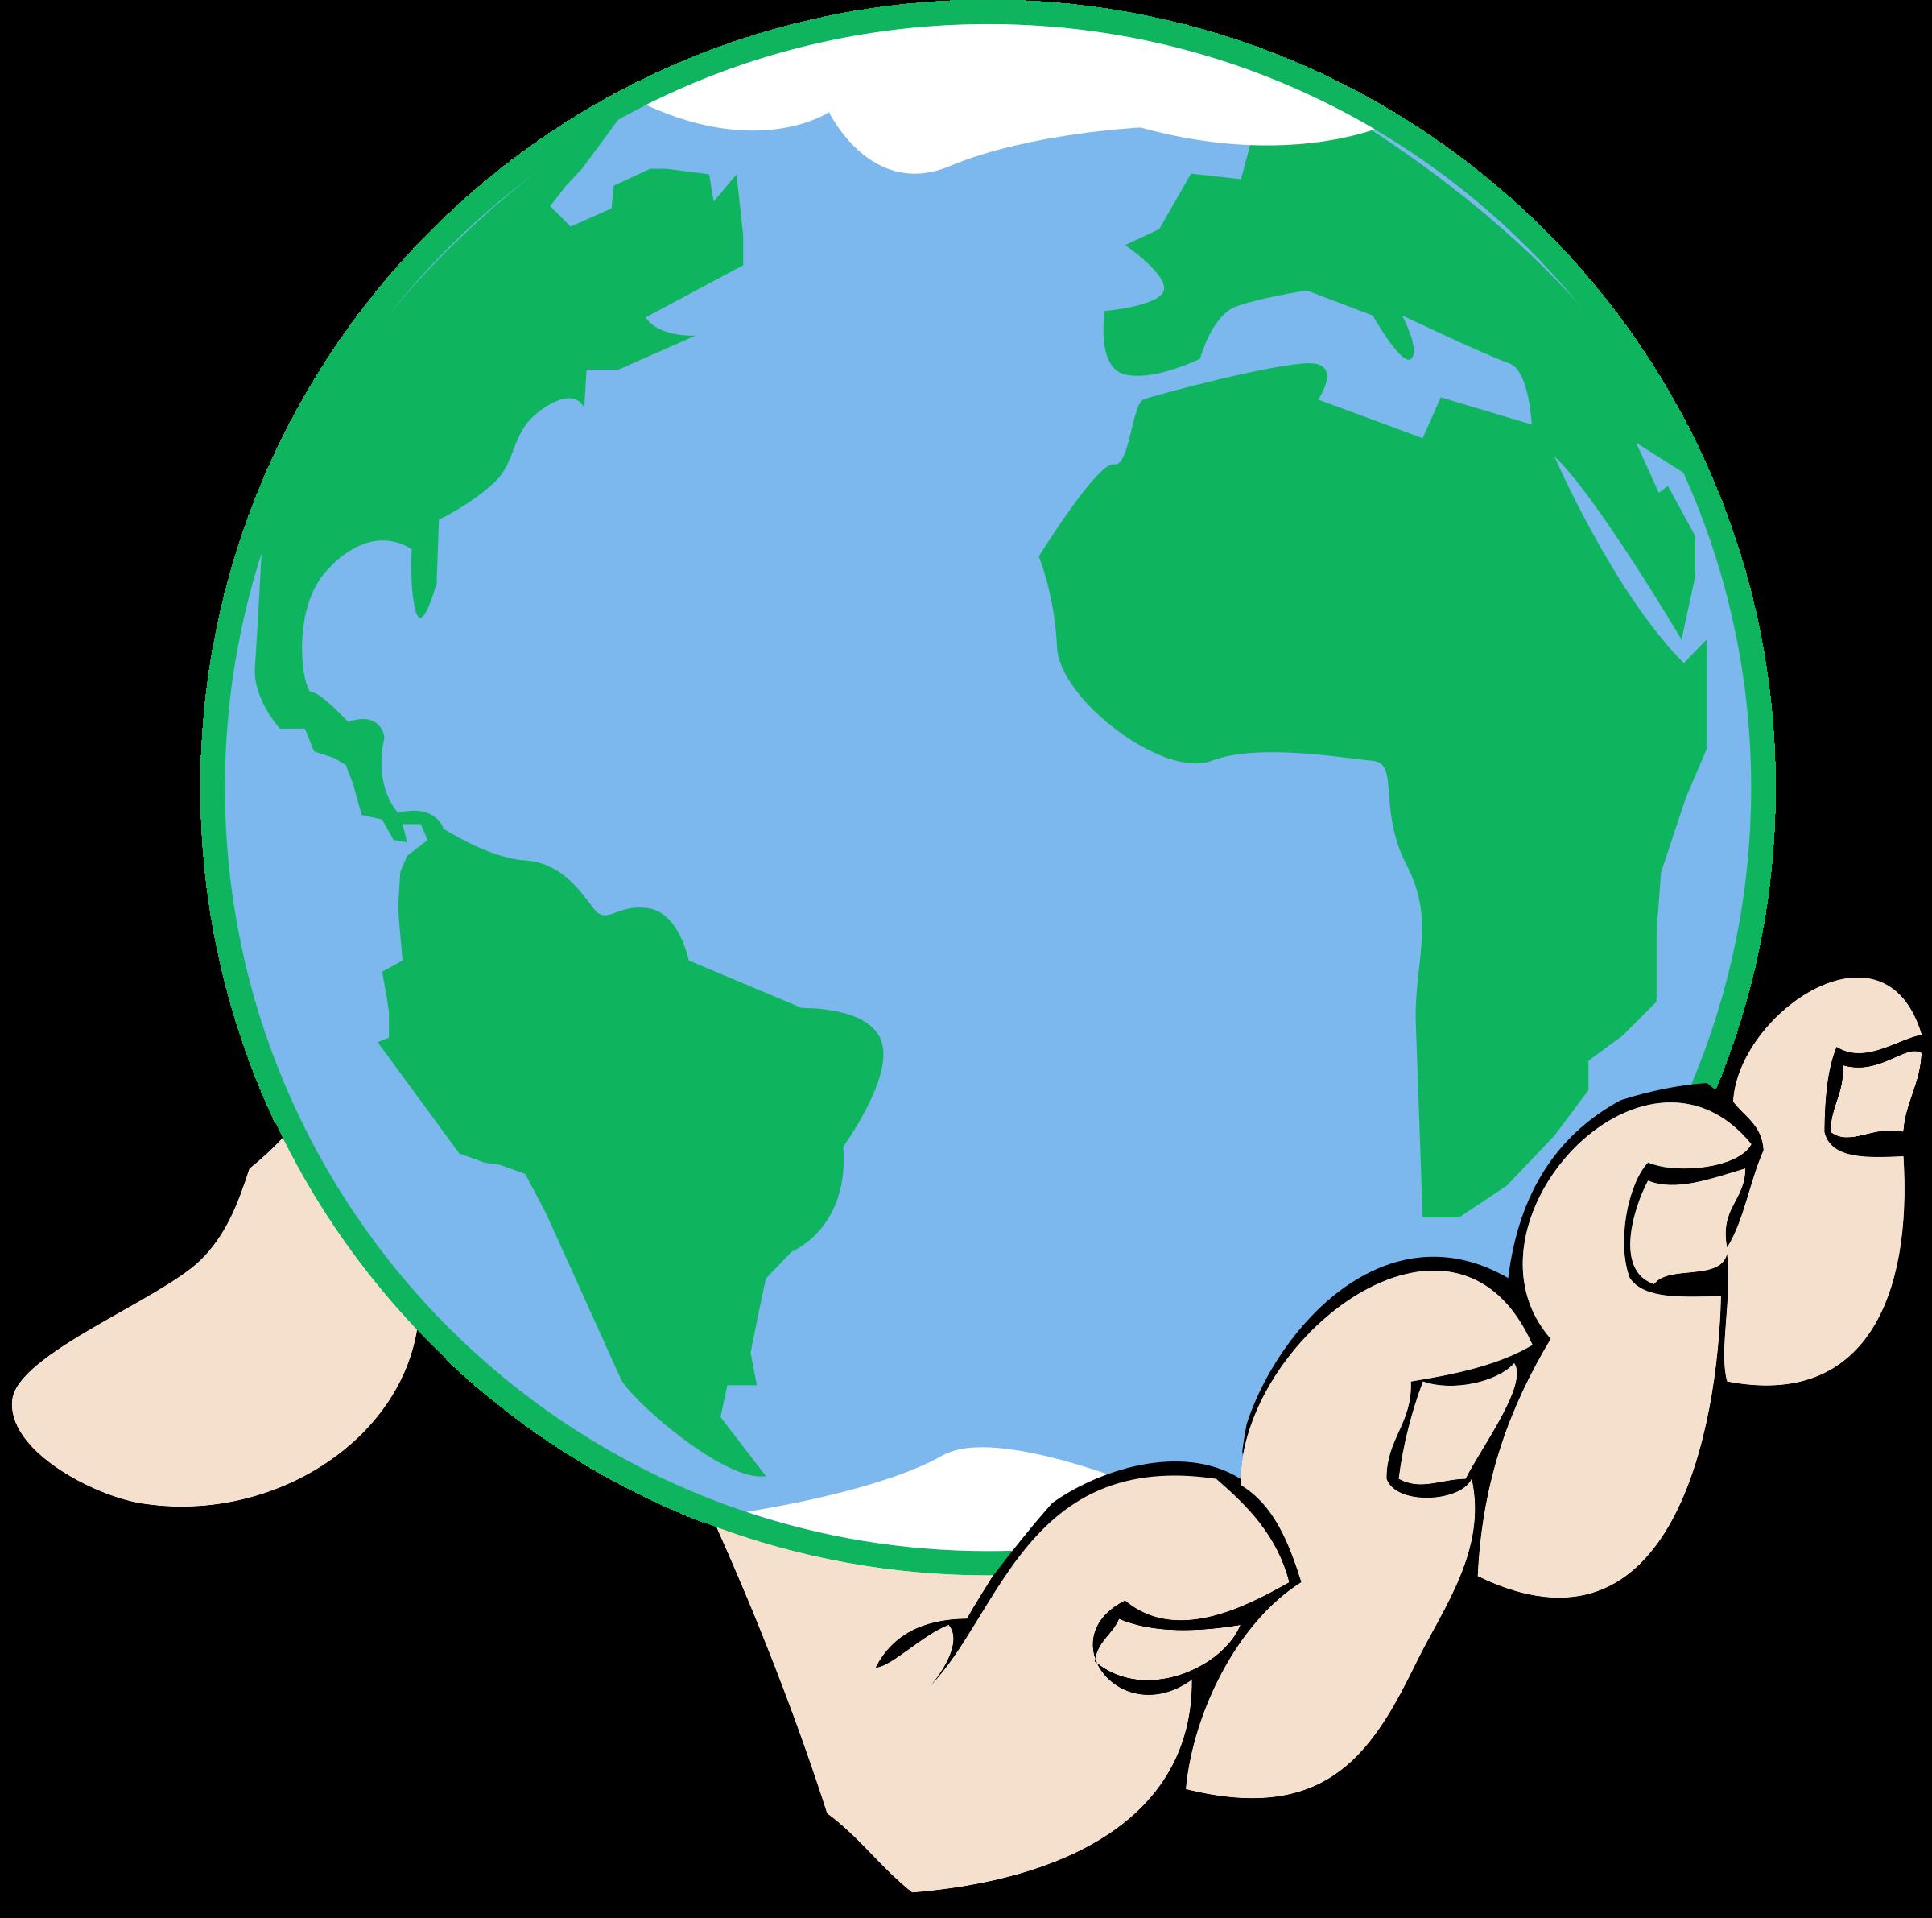 Hands clipart cute. Globe child god free